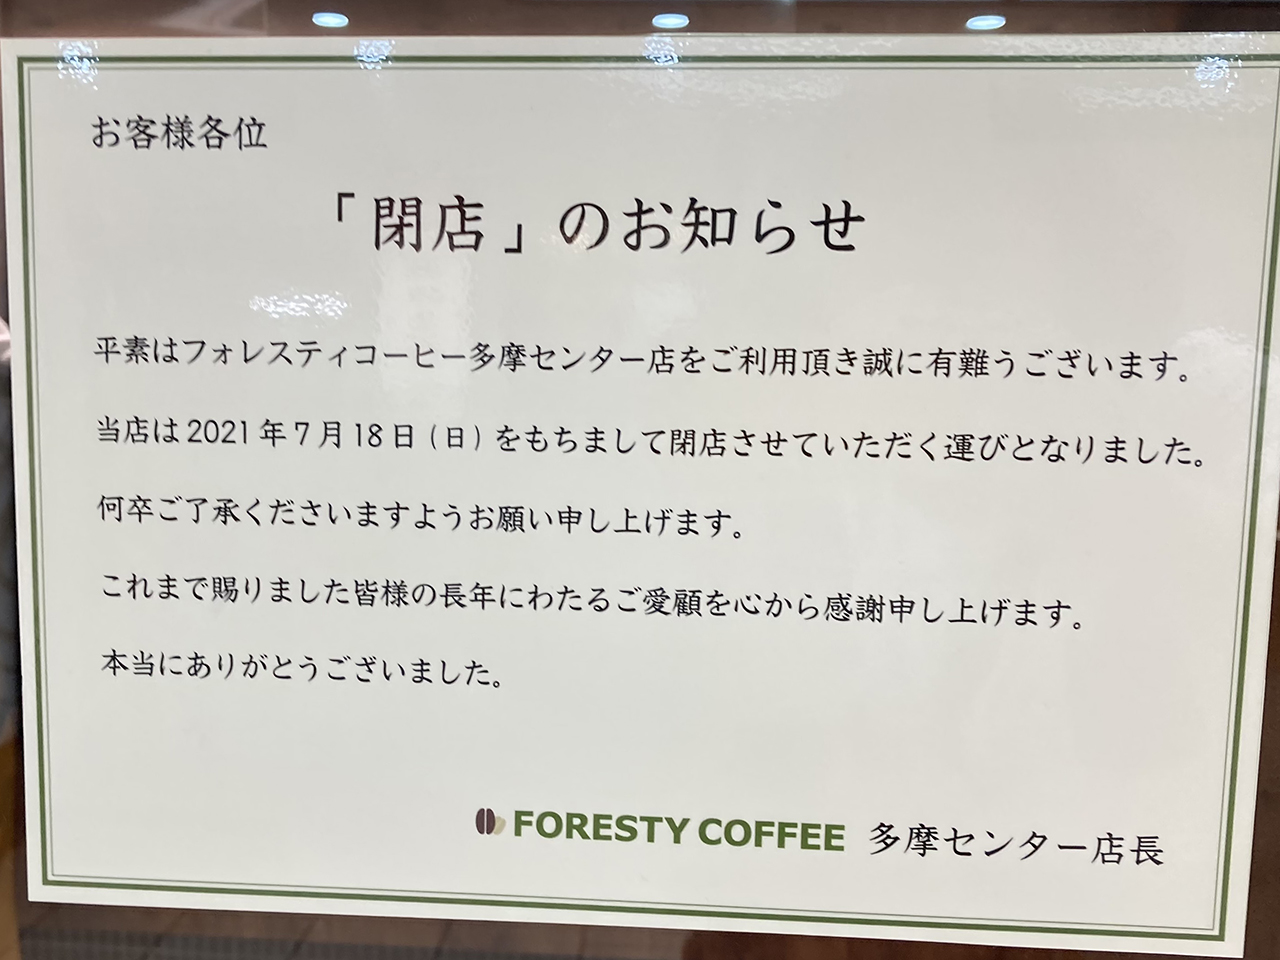 FORESTY COFFEE(フォレスティコーヒー)多摩センター店